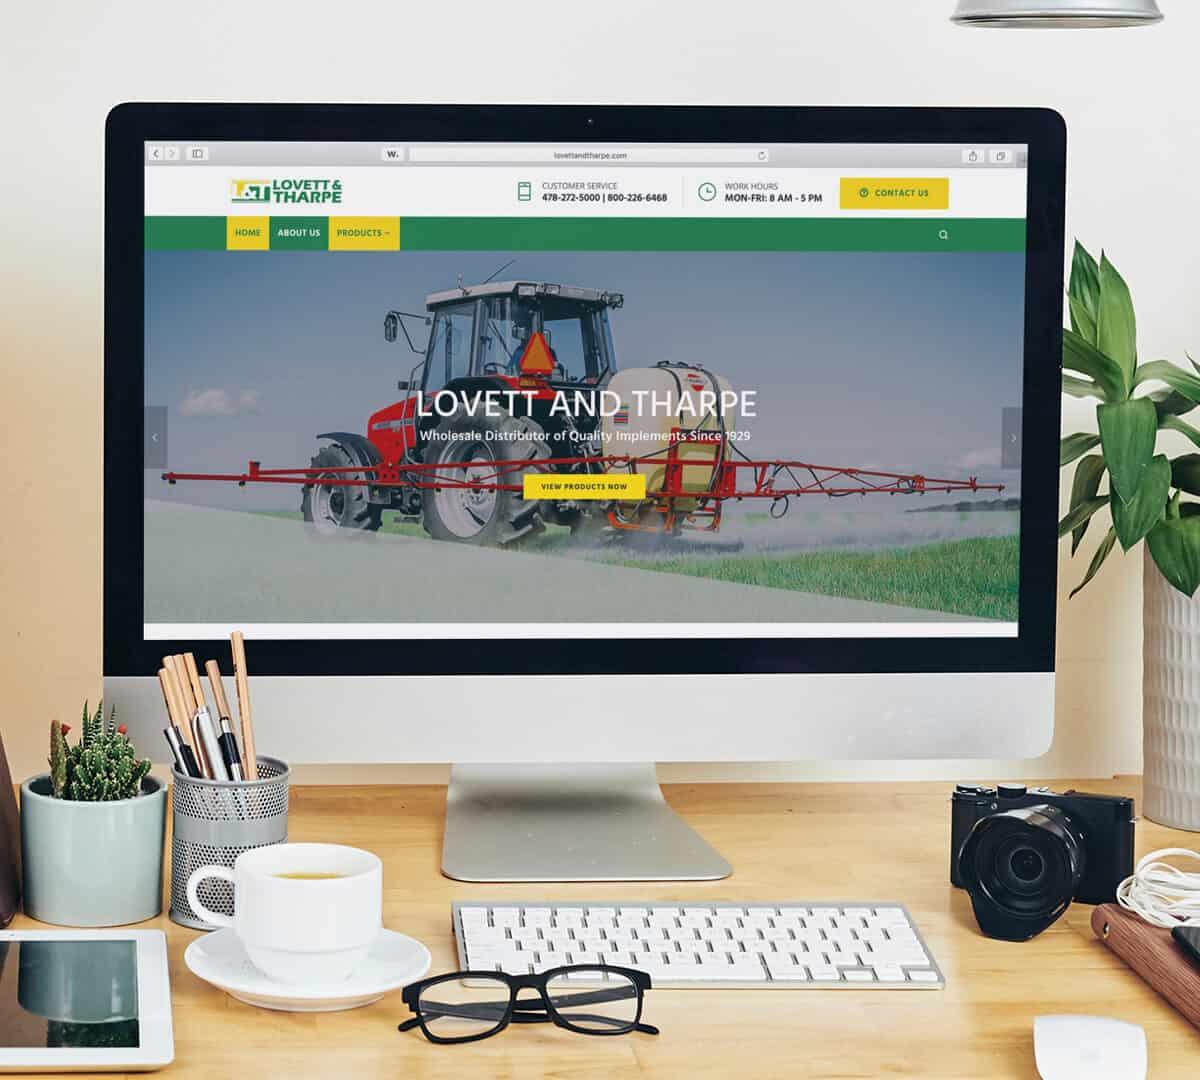 lovette and tharpe website mock copy